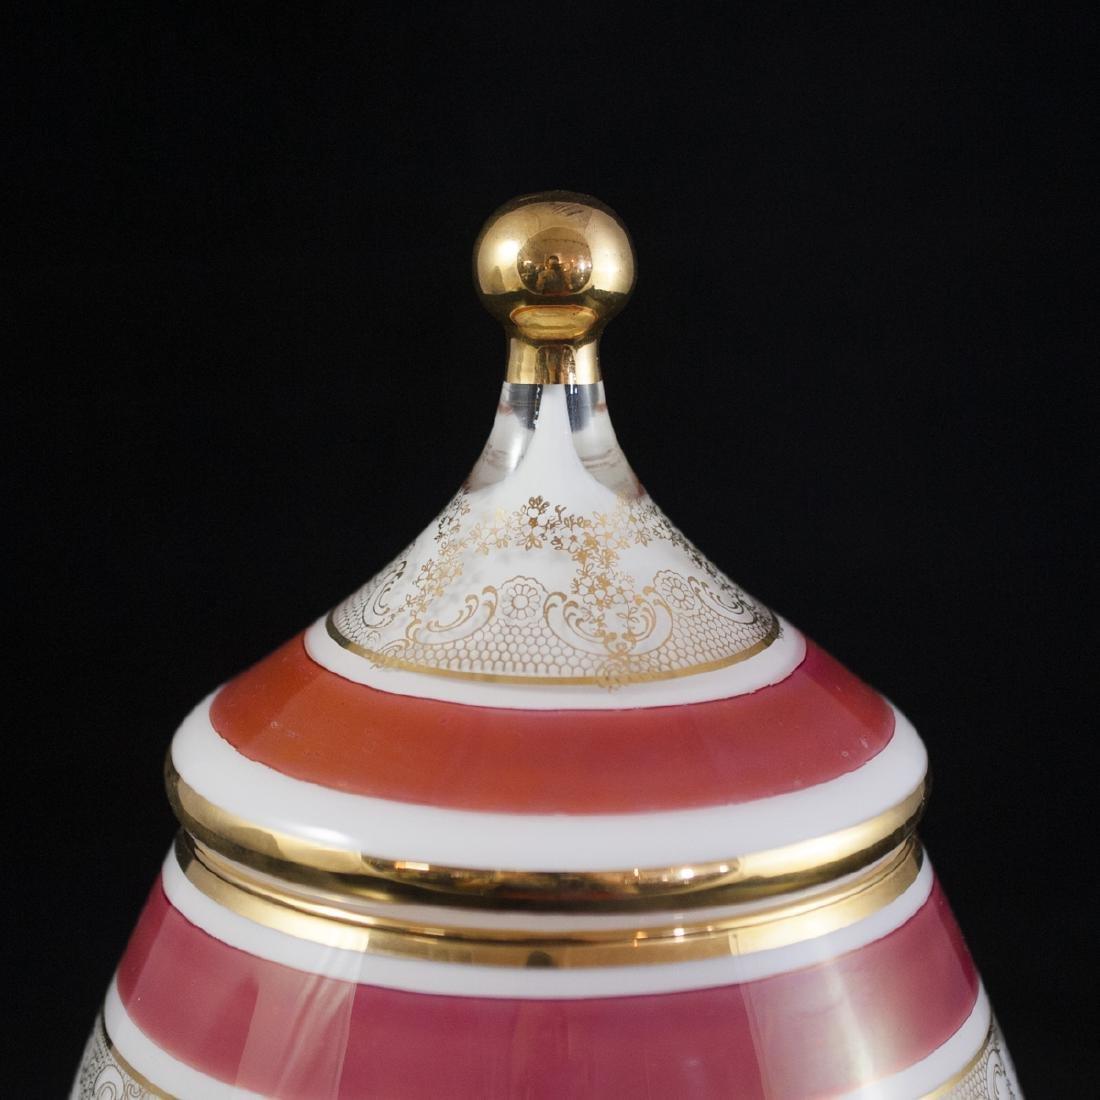 Bohemian Crystal Lidded Dish - 2